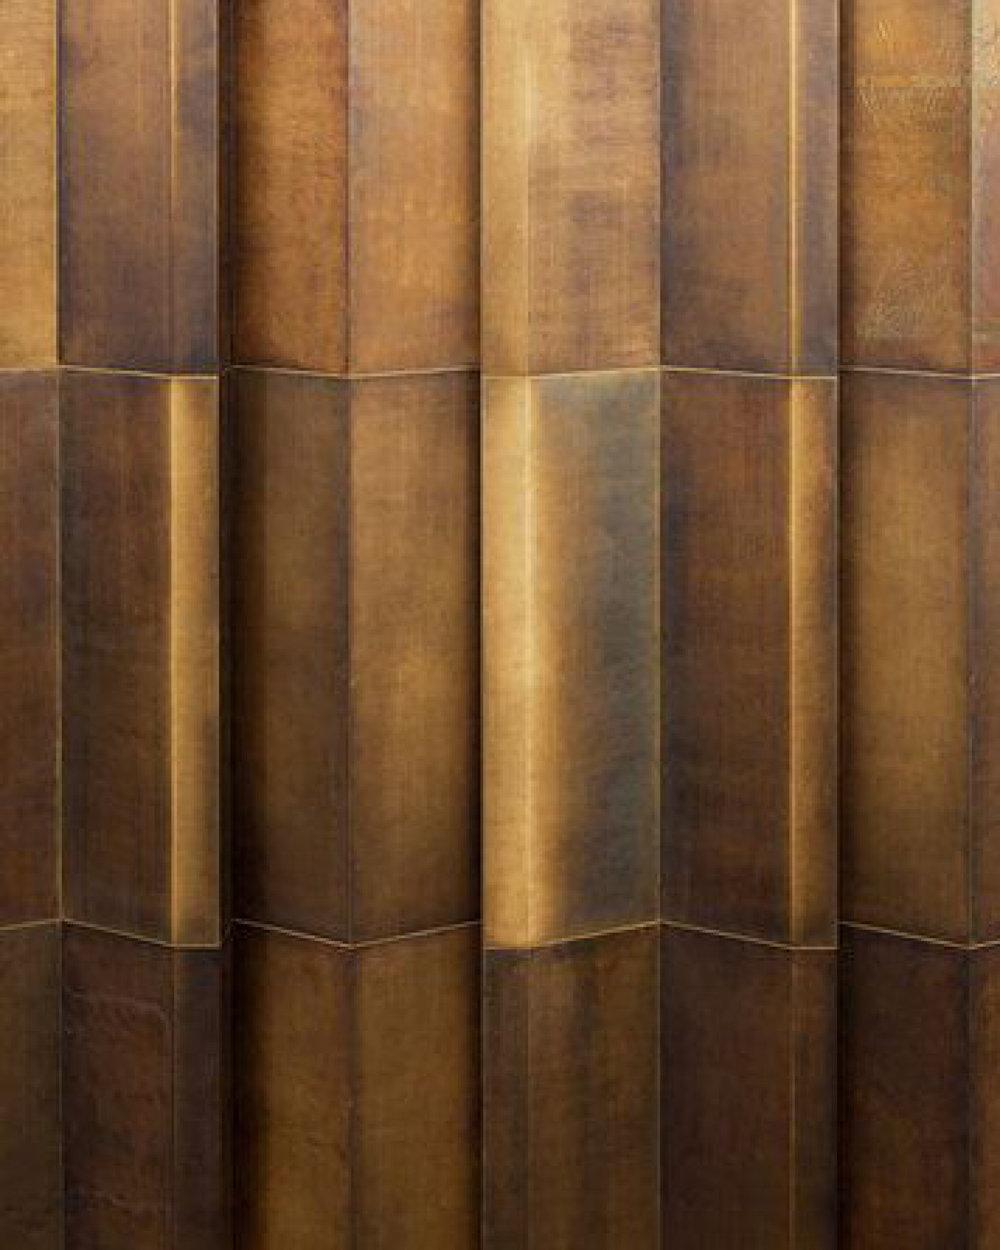 Interiors_-6.JPG